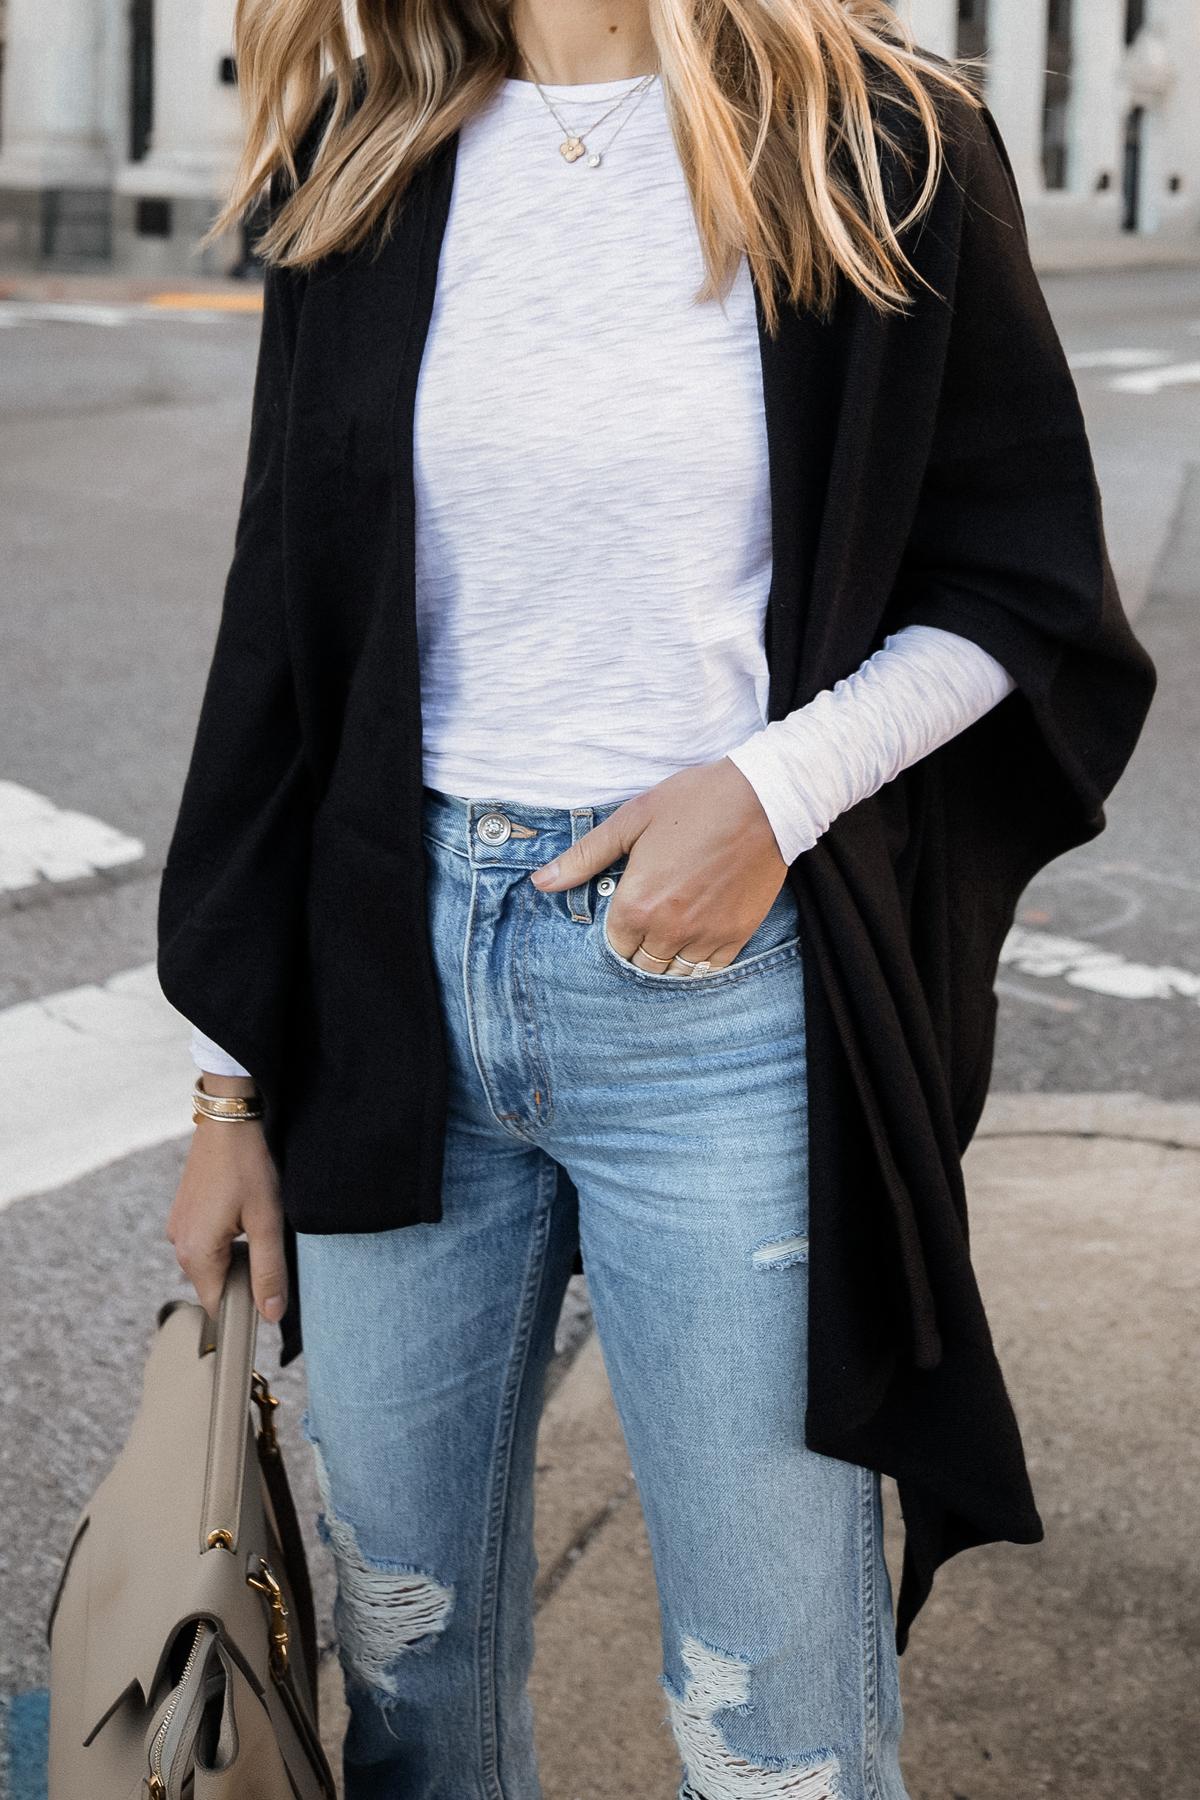 Fashion Jackson Wearing Black Poncho White Long Sleeve Top Ripped Jeans